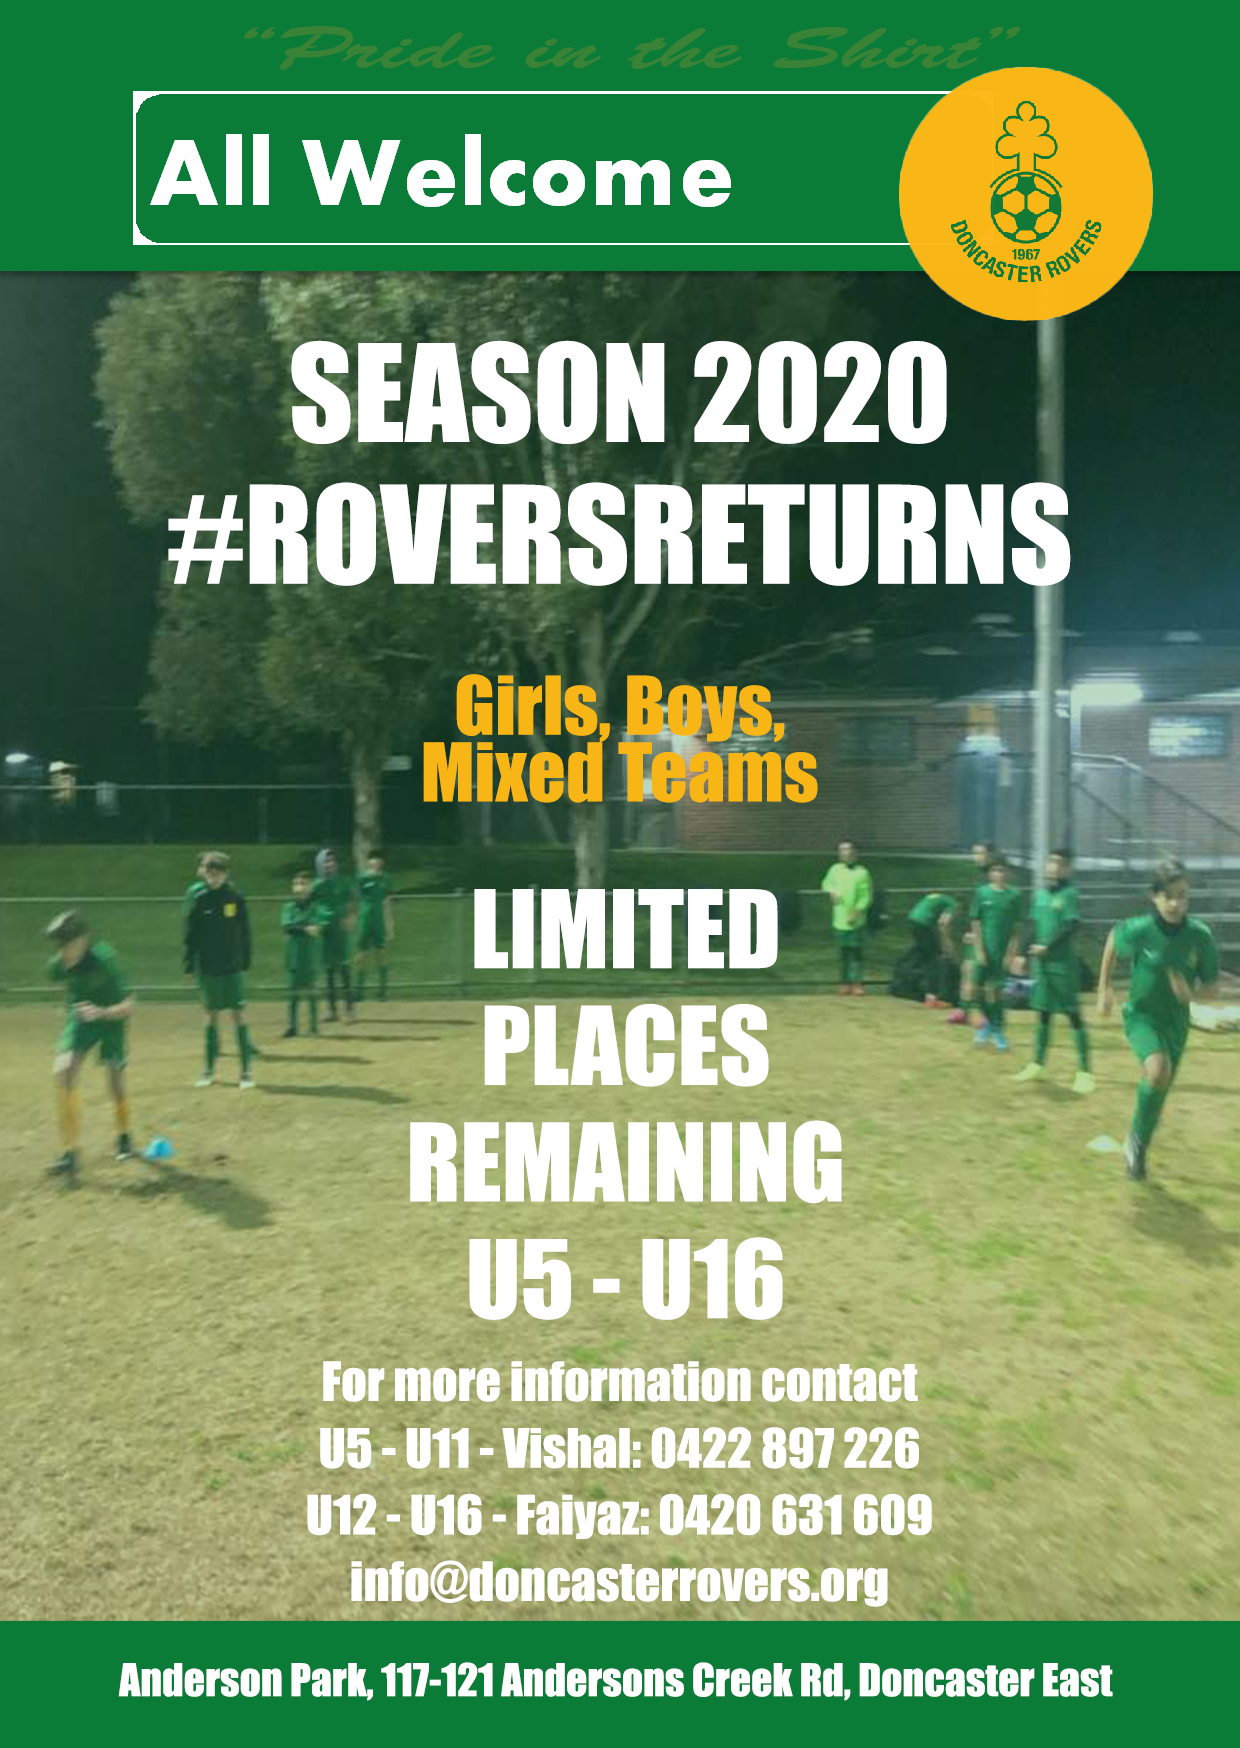 2020 #Roversreturns